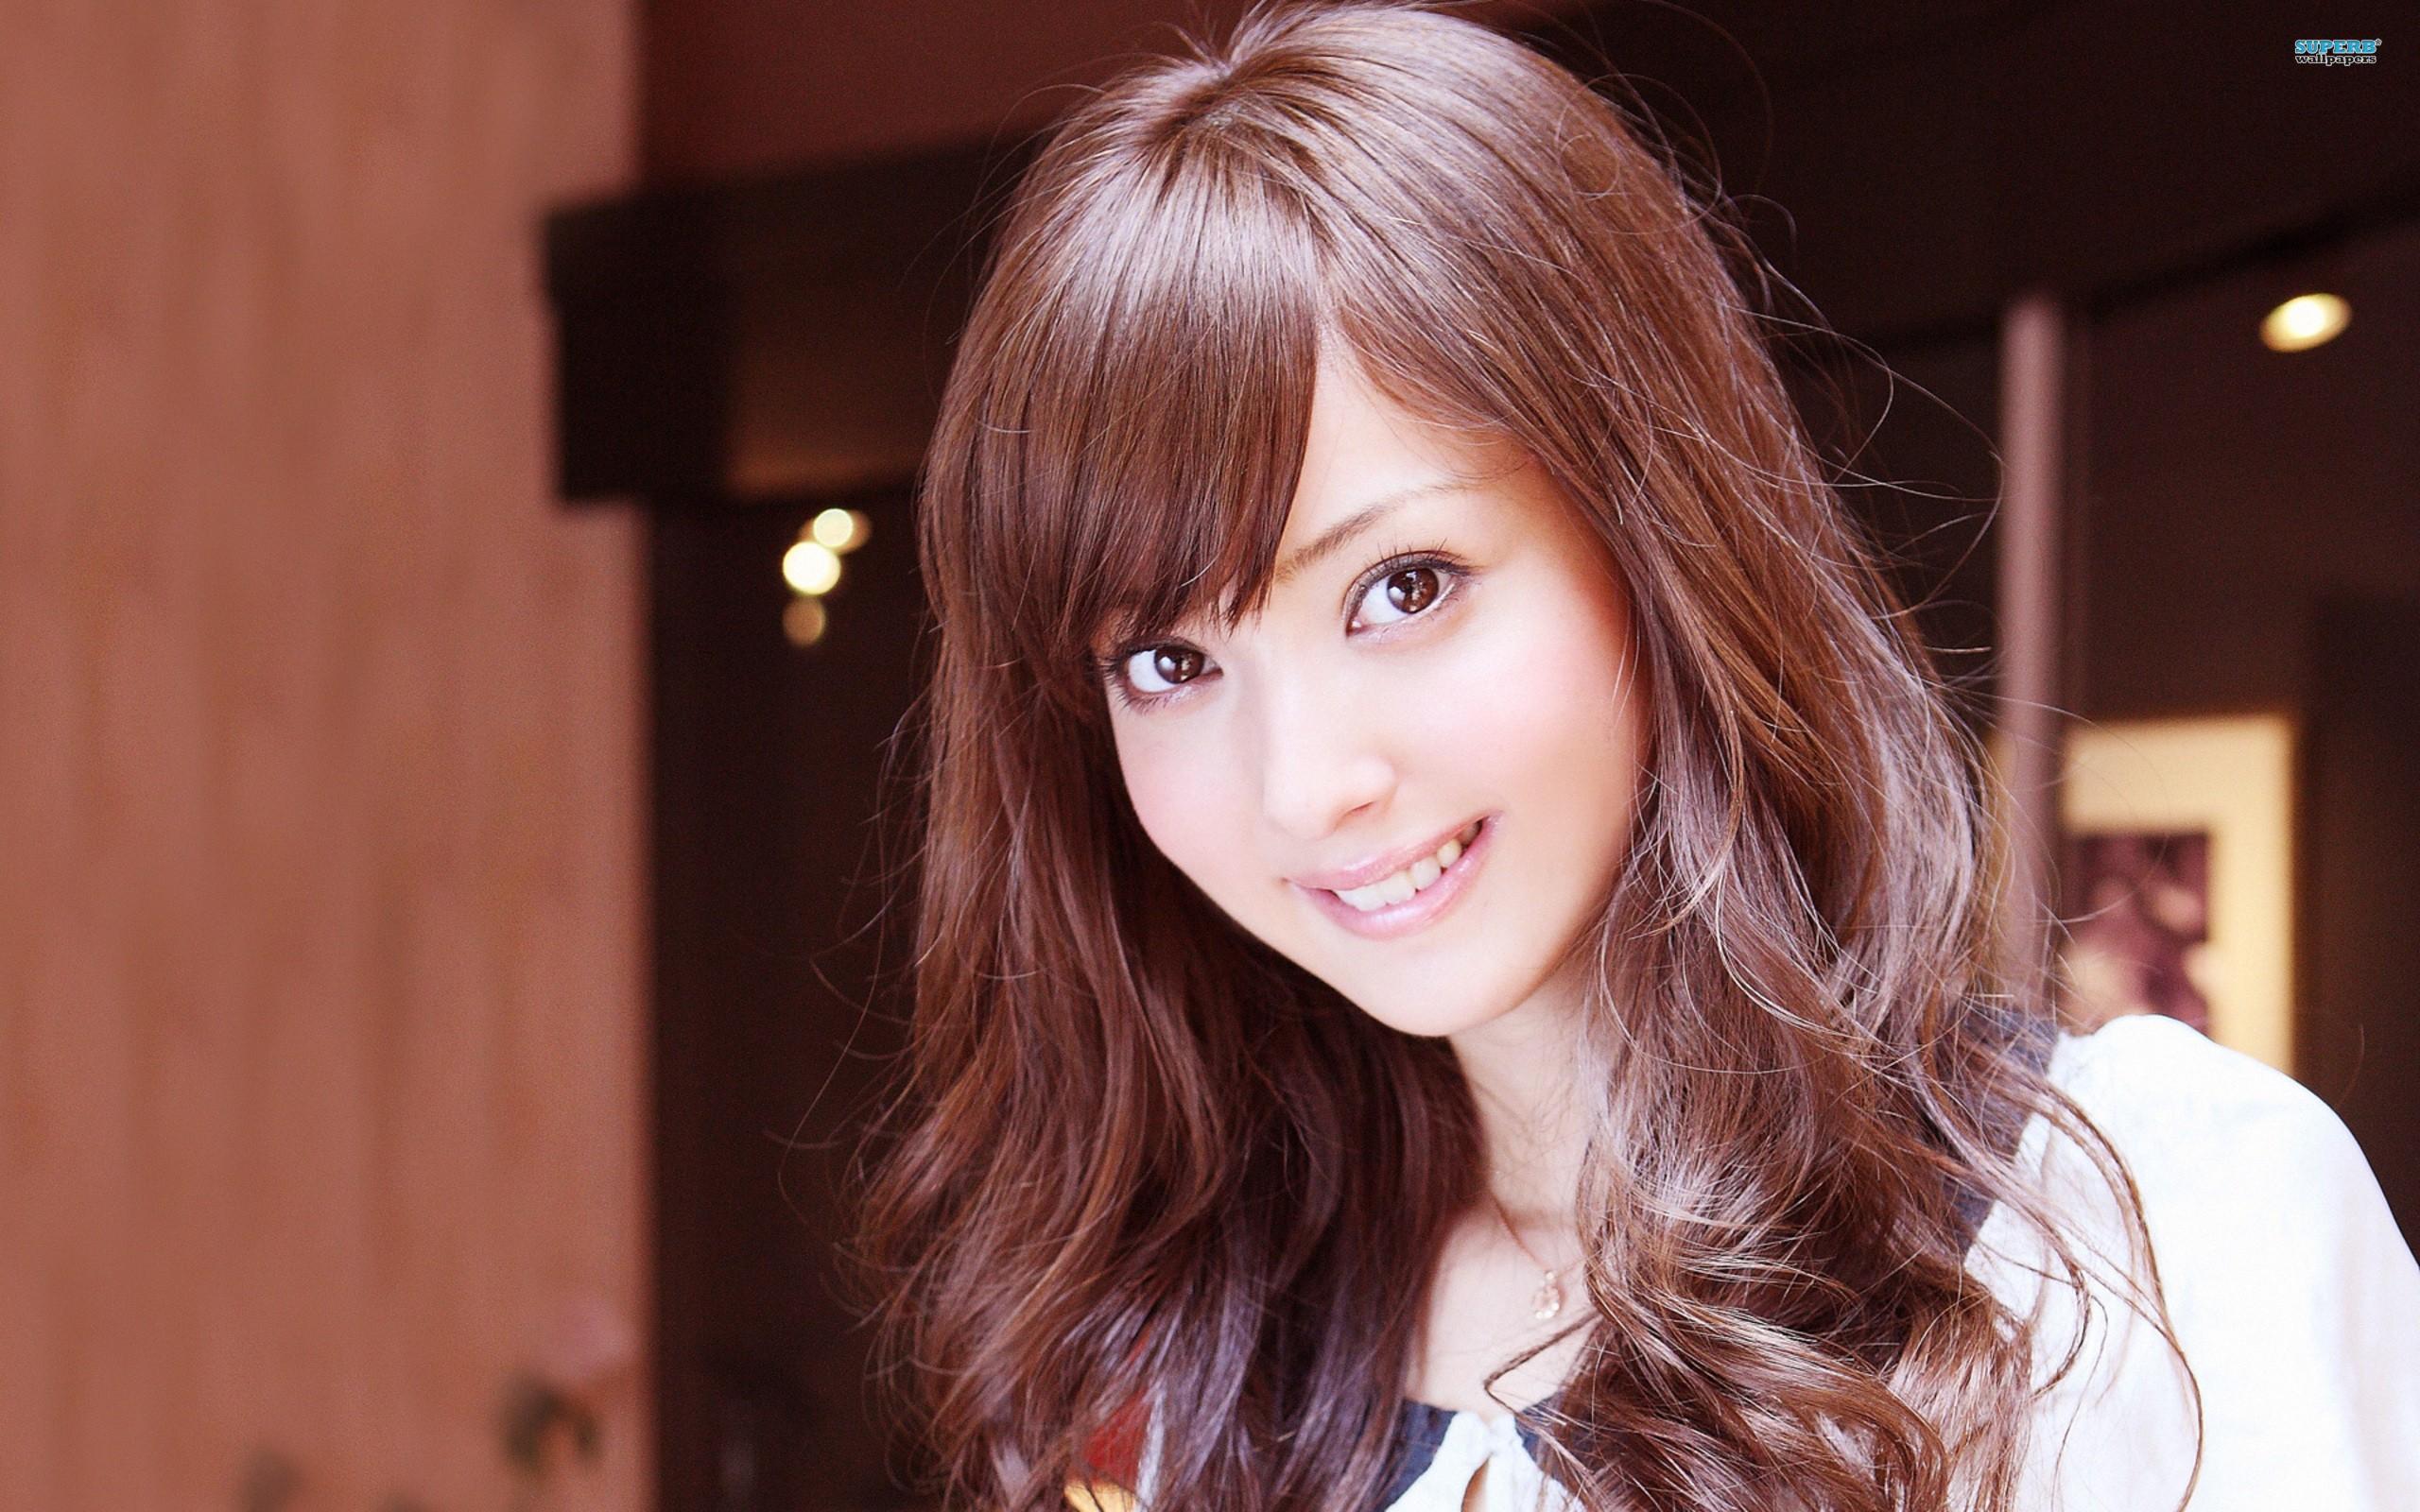 Chica japonesa